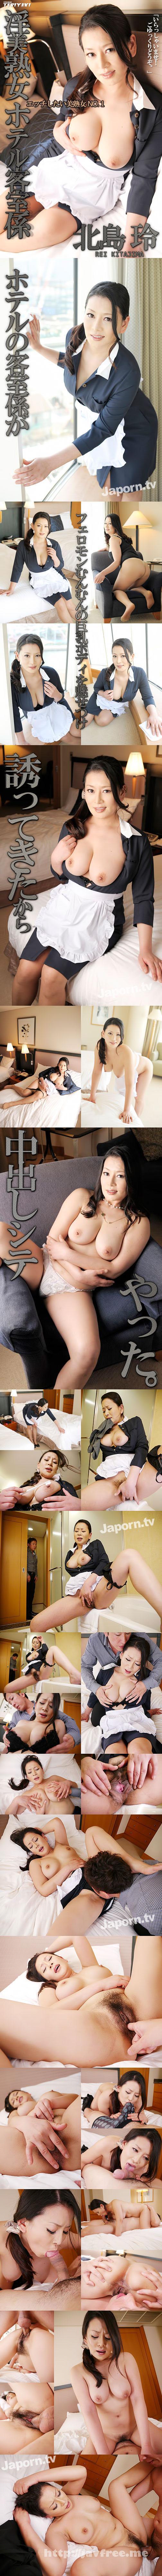 [BT 120] 淫美熟女ホテル客室係 : 北島玲 北島玲 Rei Kitajima BT